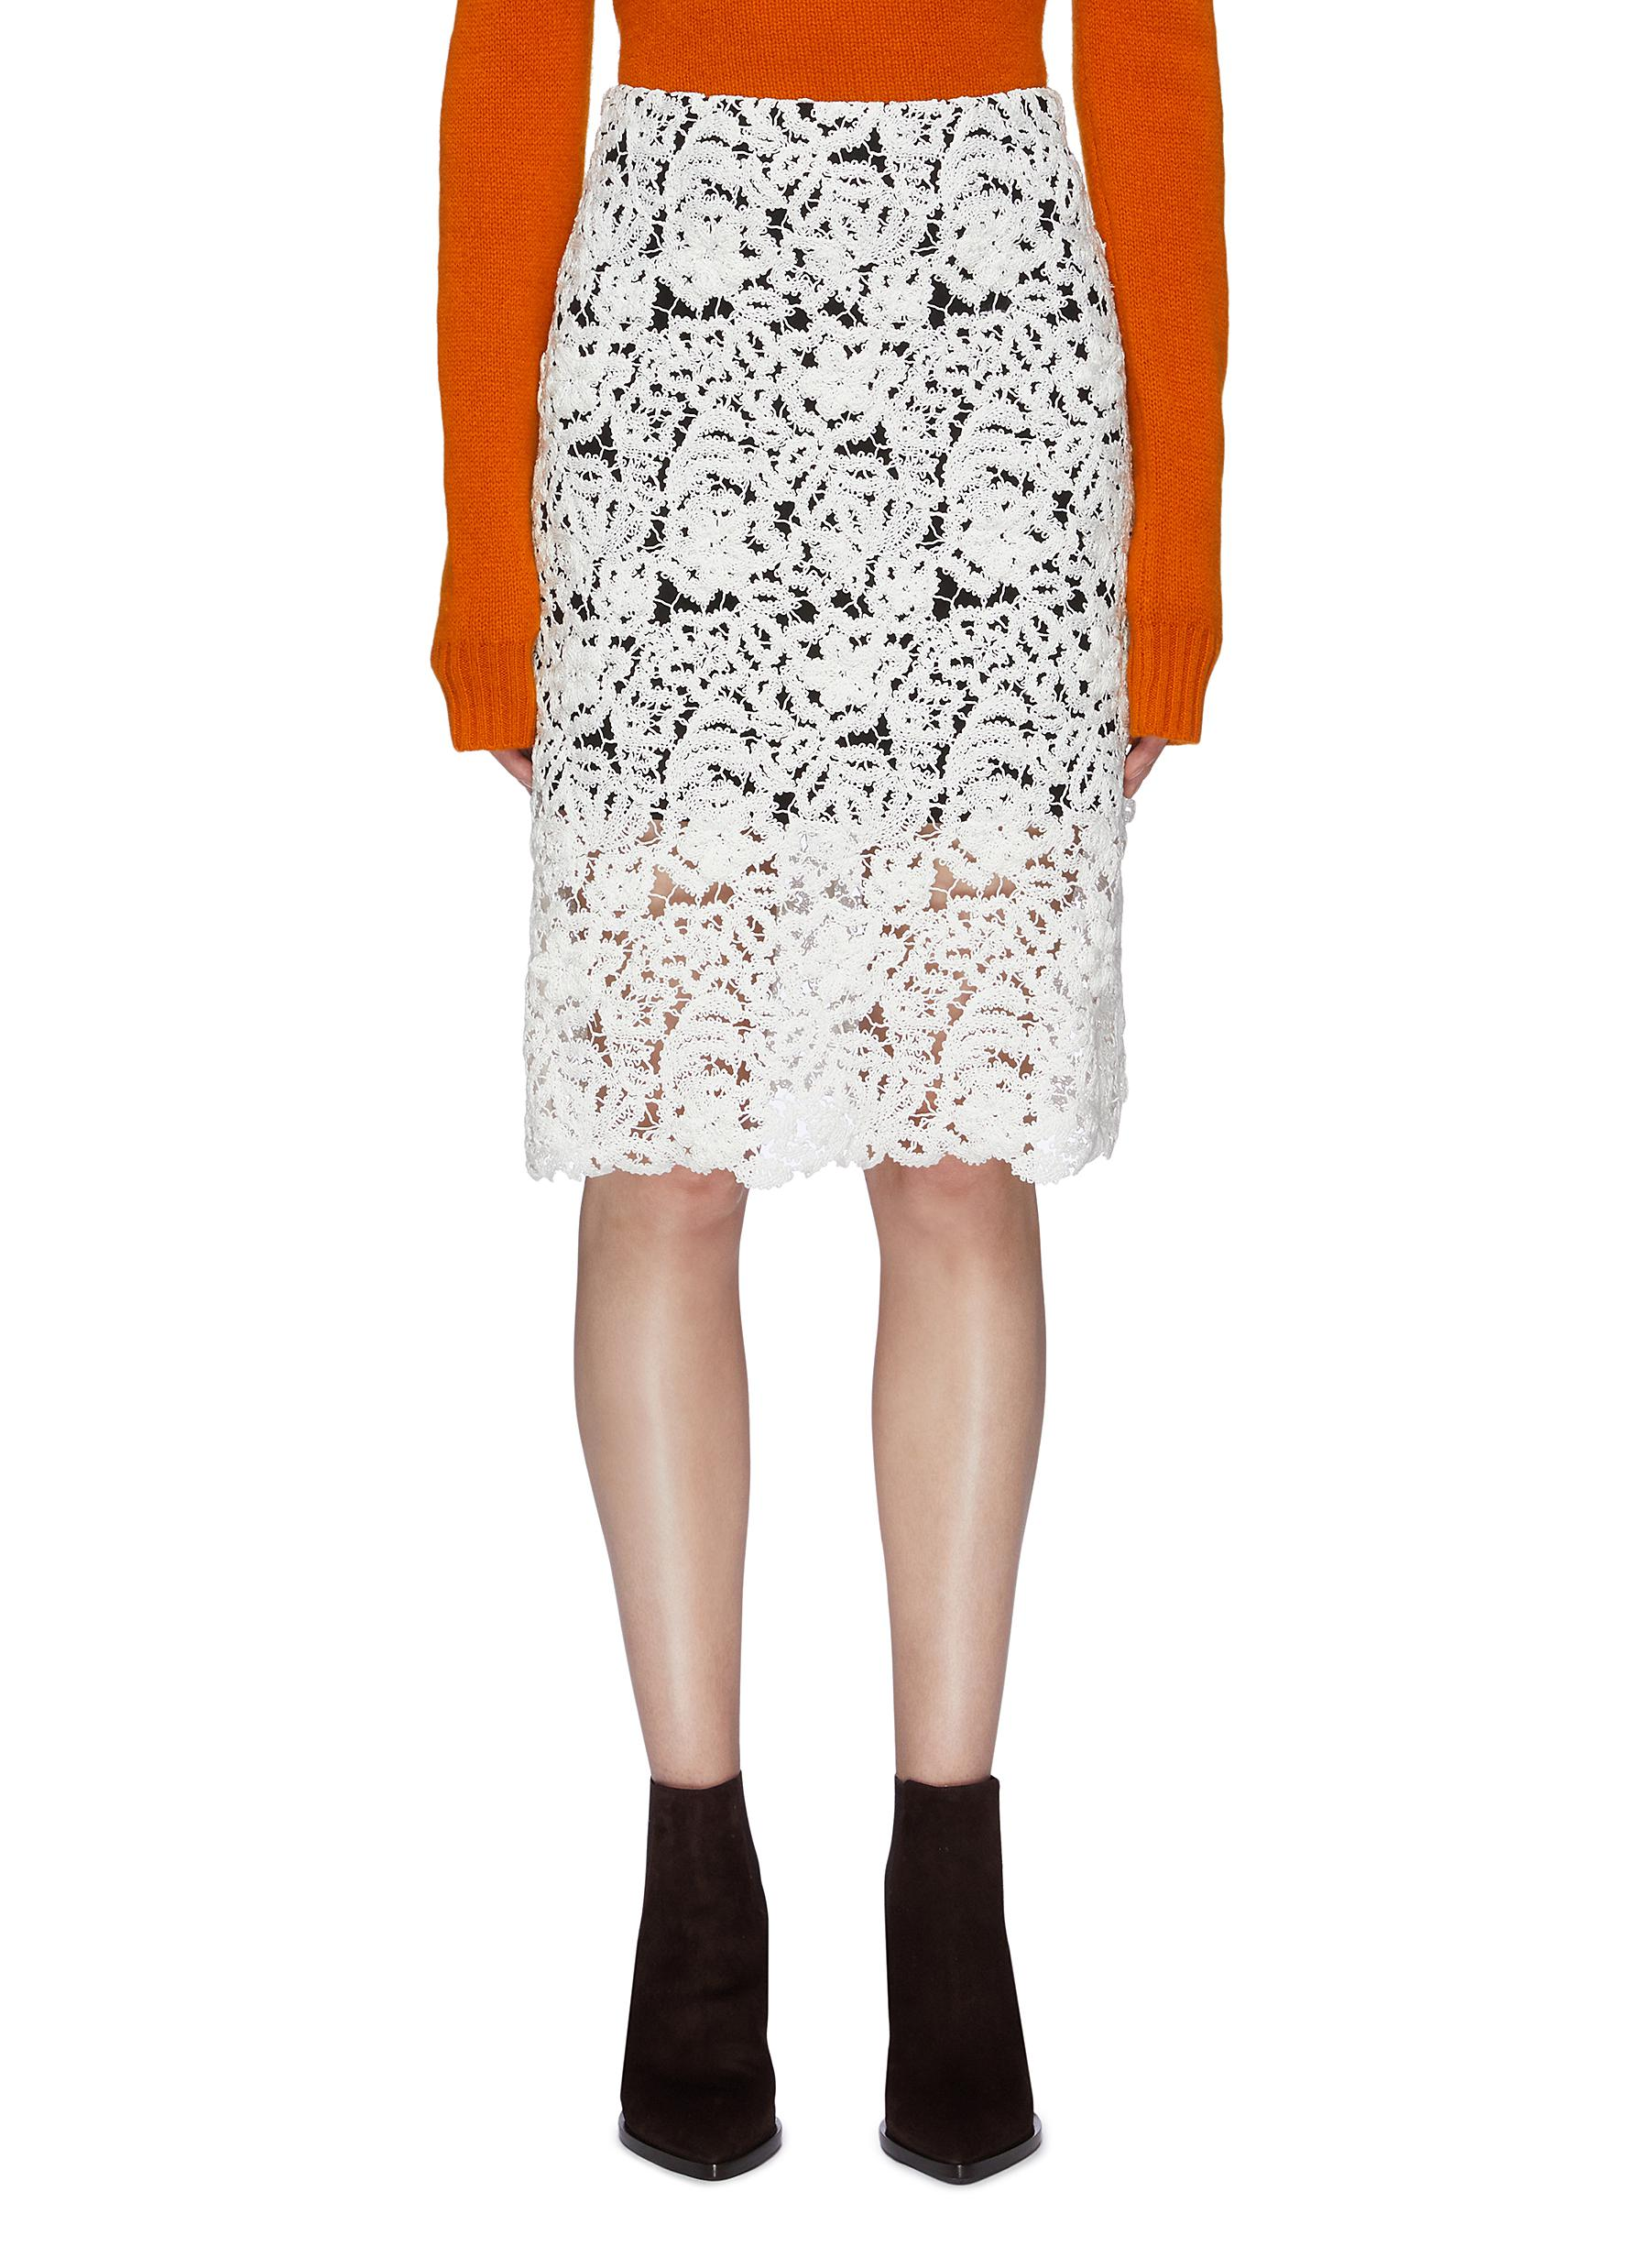 Floral guipure lace pencil skirt by Chloé